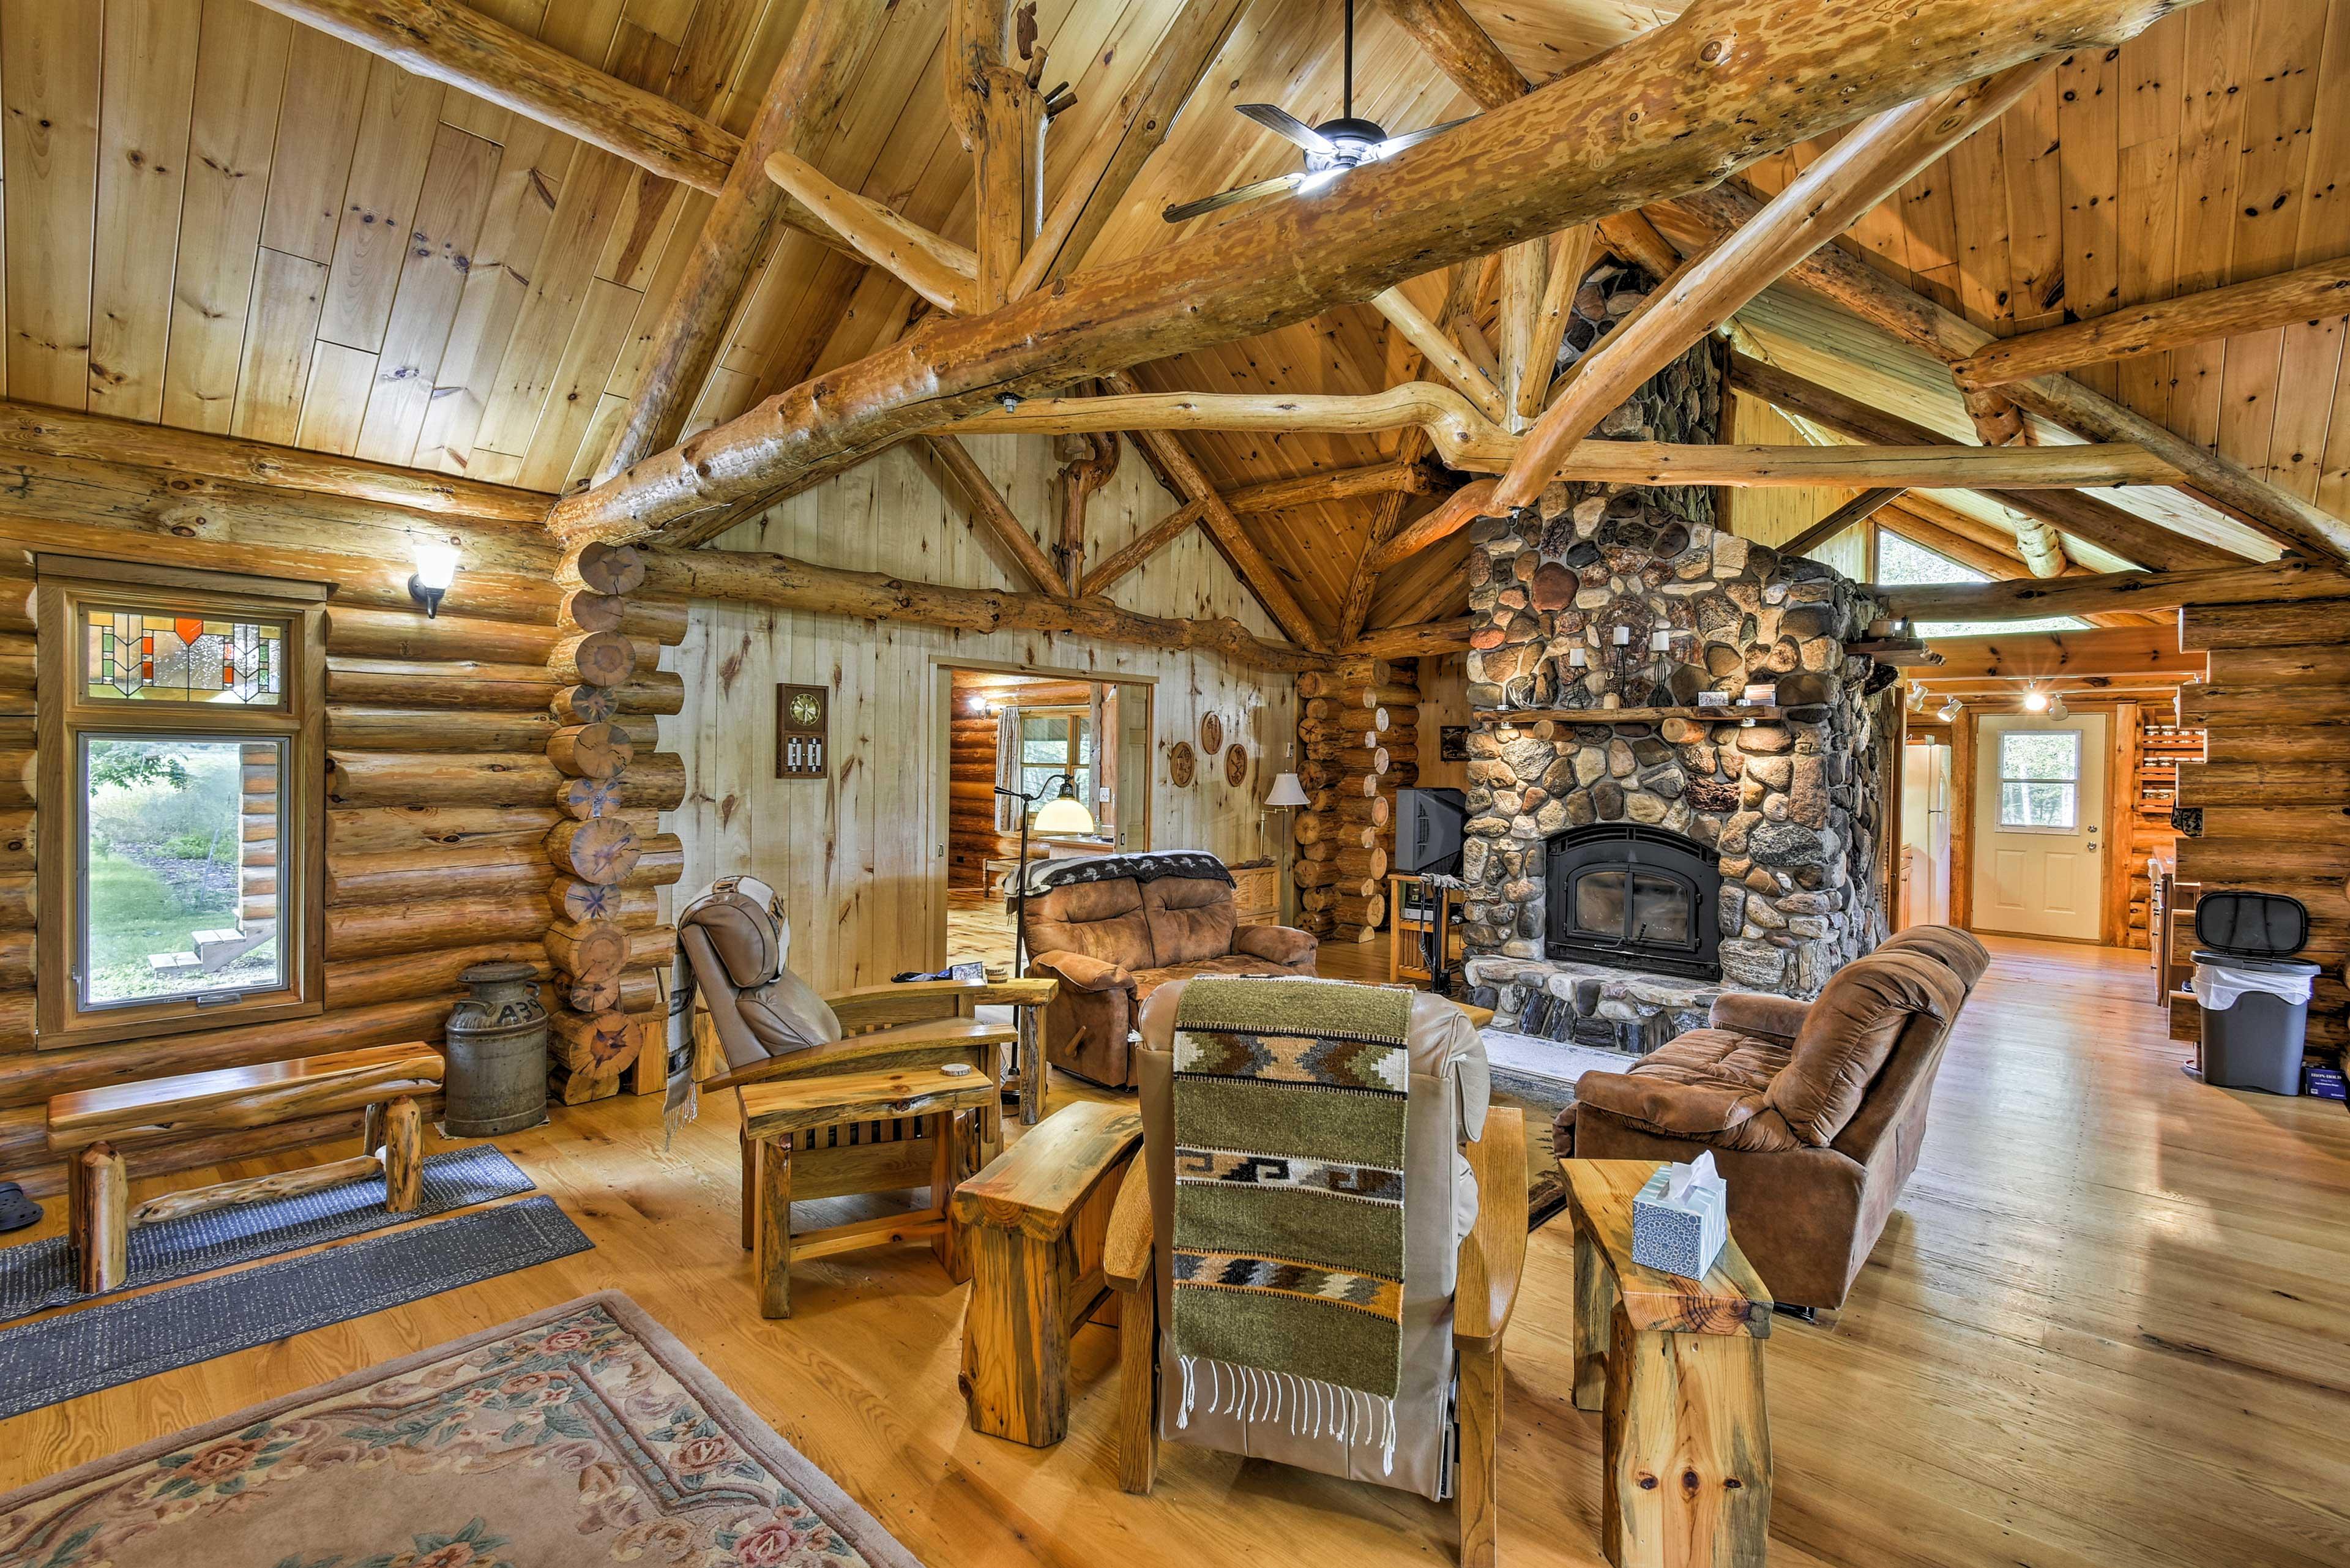 Living Room | A Few Steps to Enter